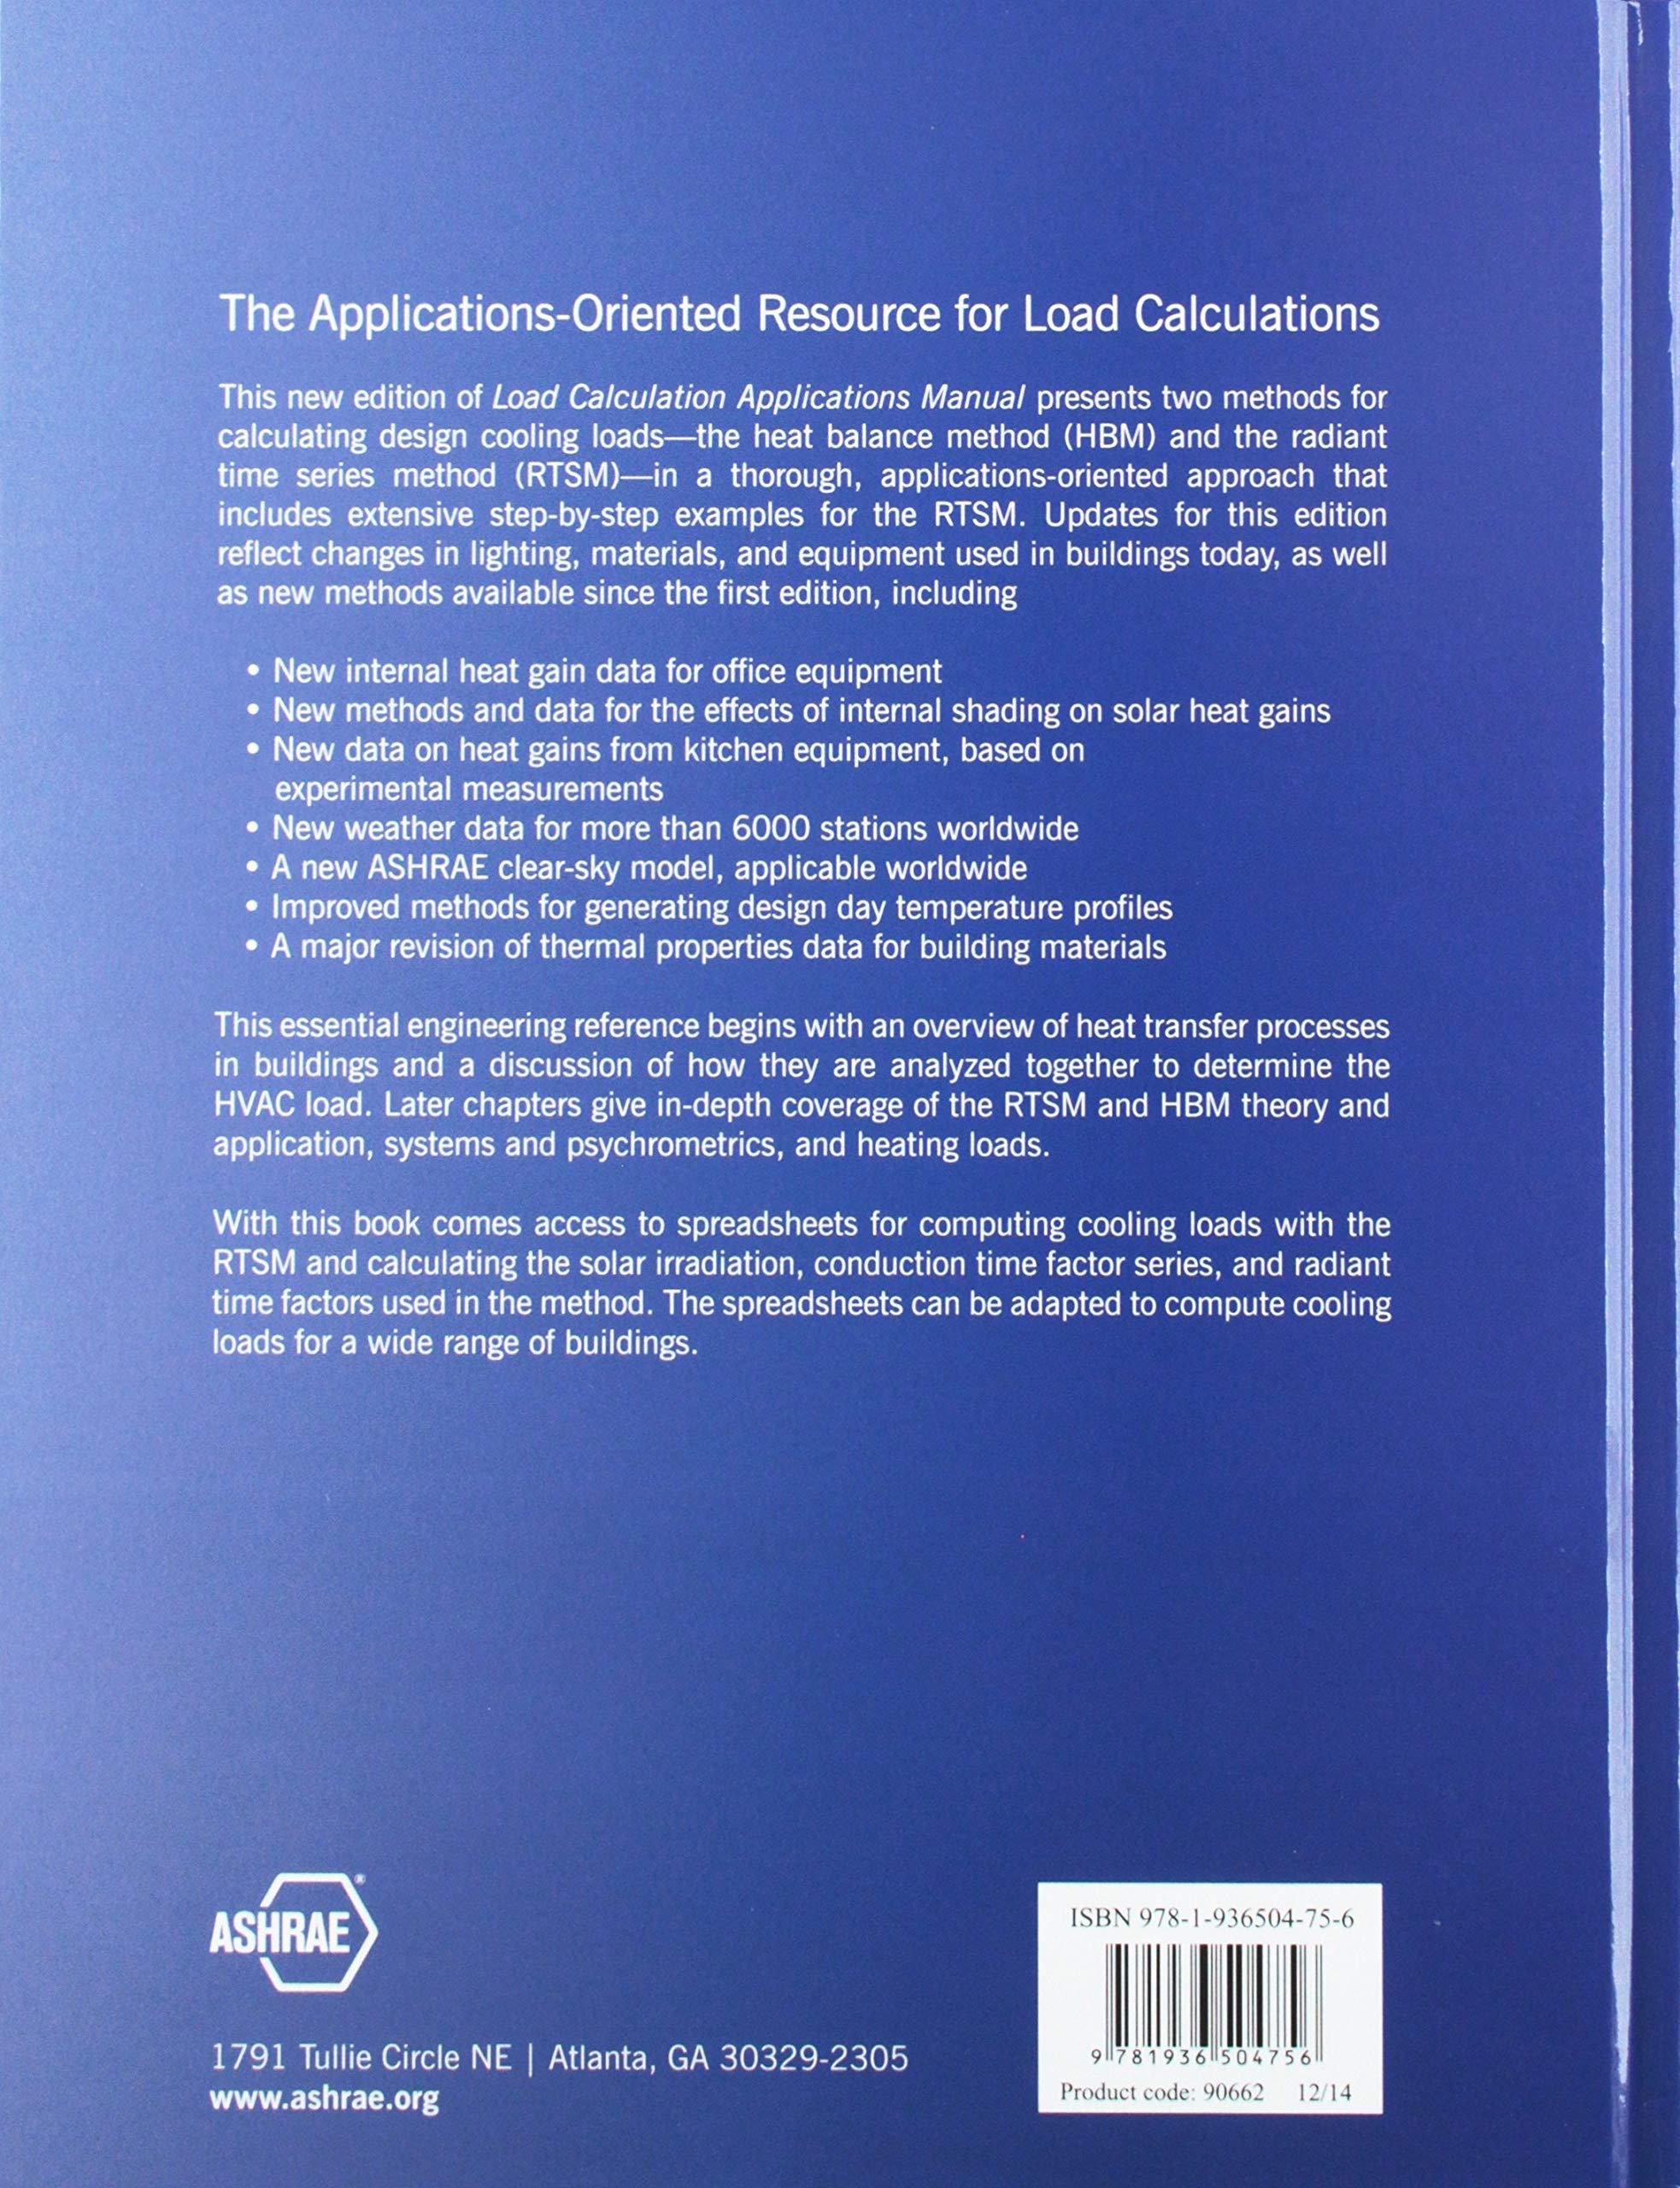 Load Calculation Applications Manual I-P version: ASHRAE